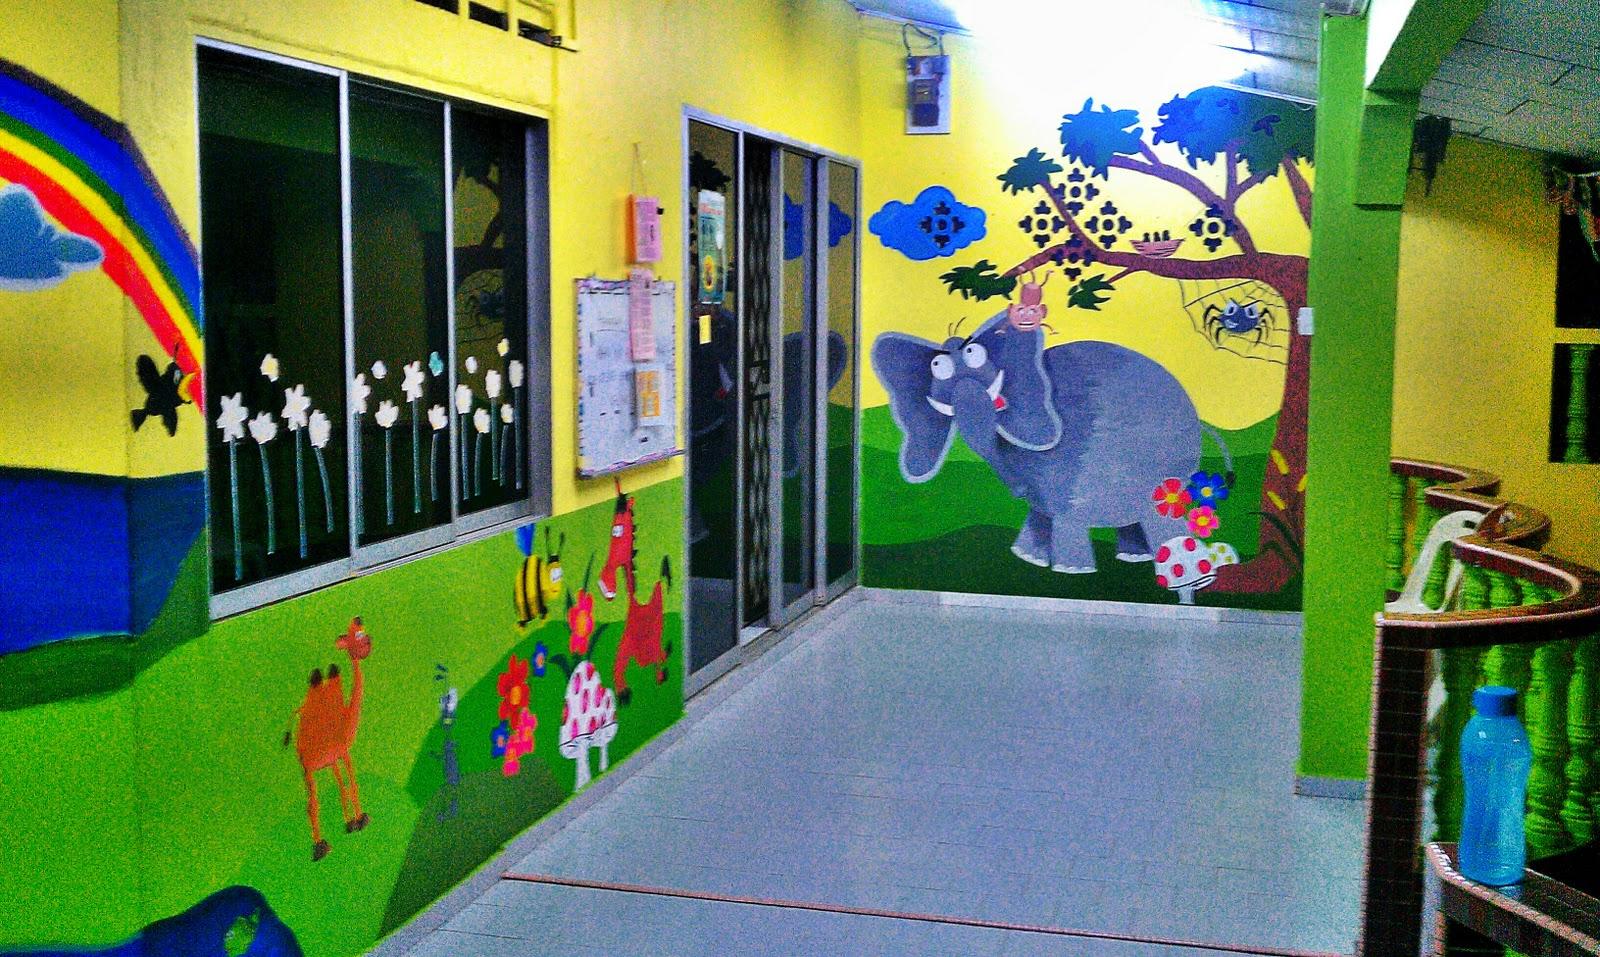 Miext 39 12 e for Contoh lukisan mural tadika